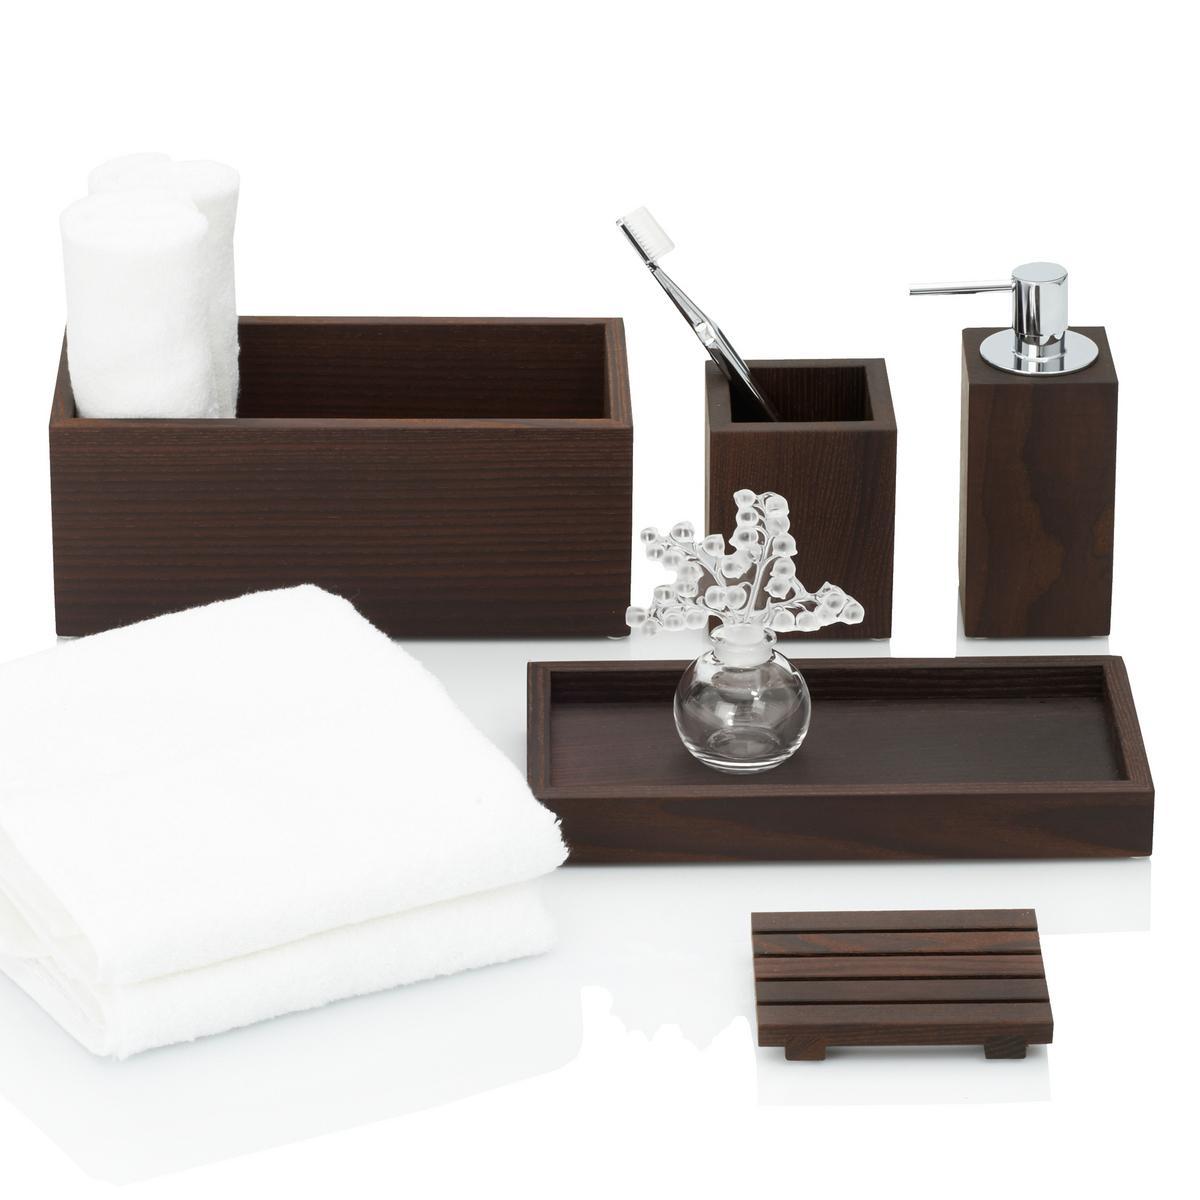 Decor walther wood bathroom accessories dark thermo ash for Wooden bathroom accessories